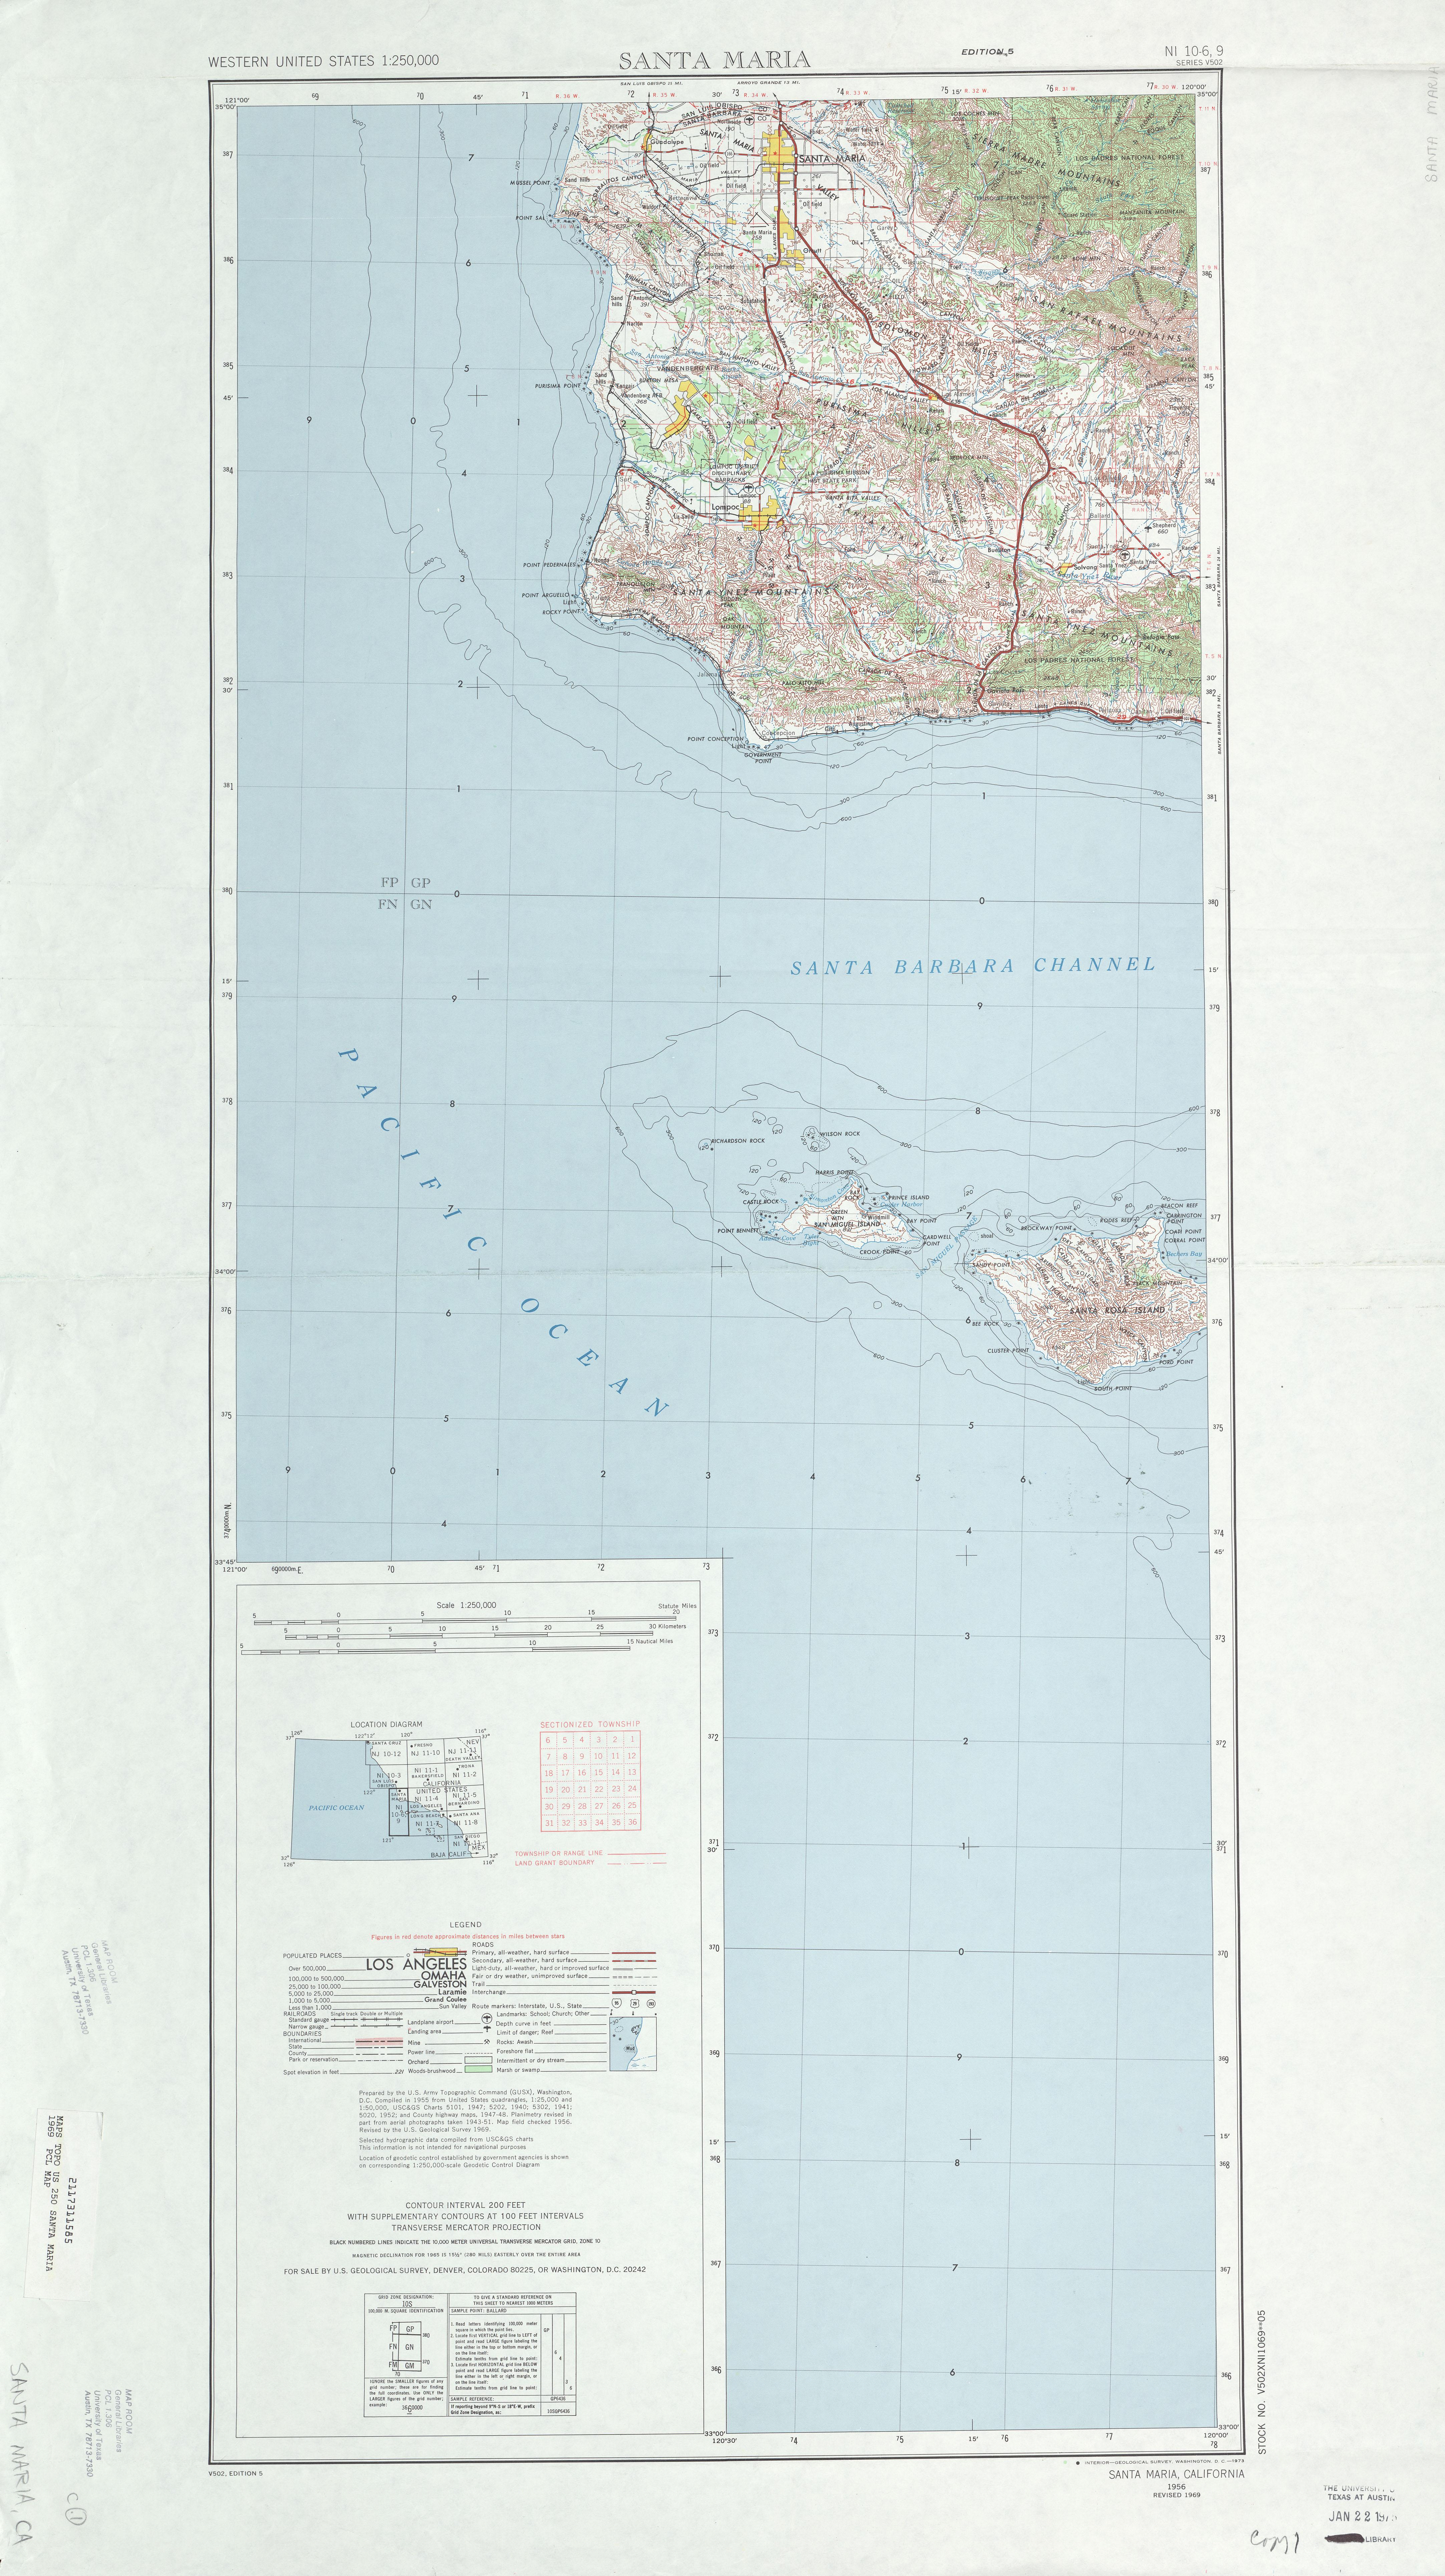 Santa Maria Topographic Map Sheet, United States 1969